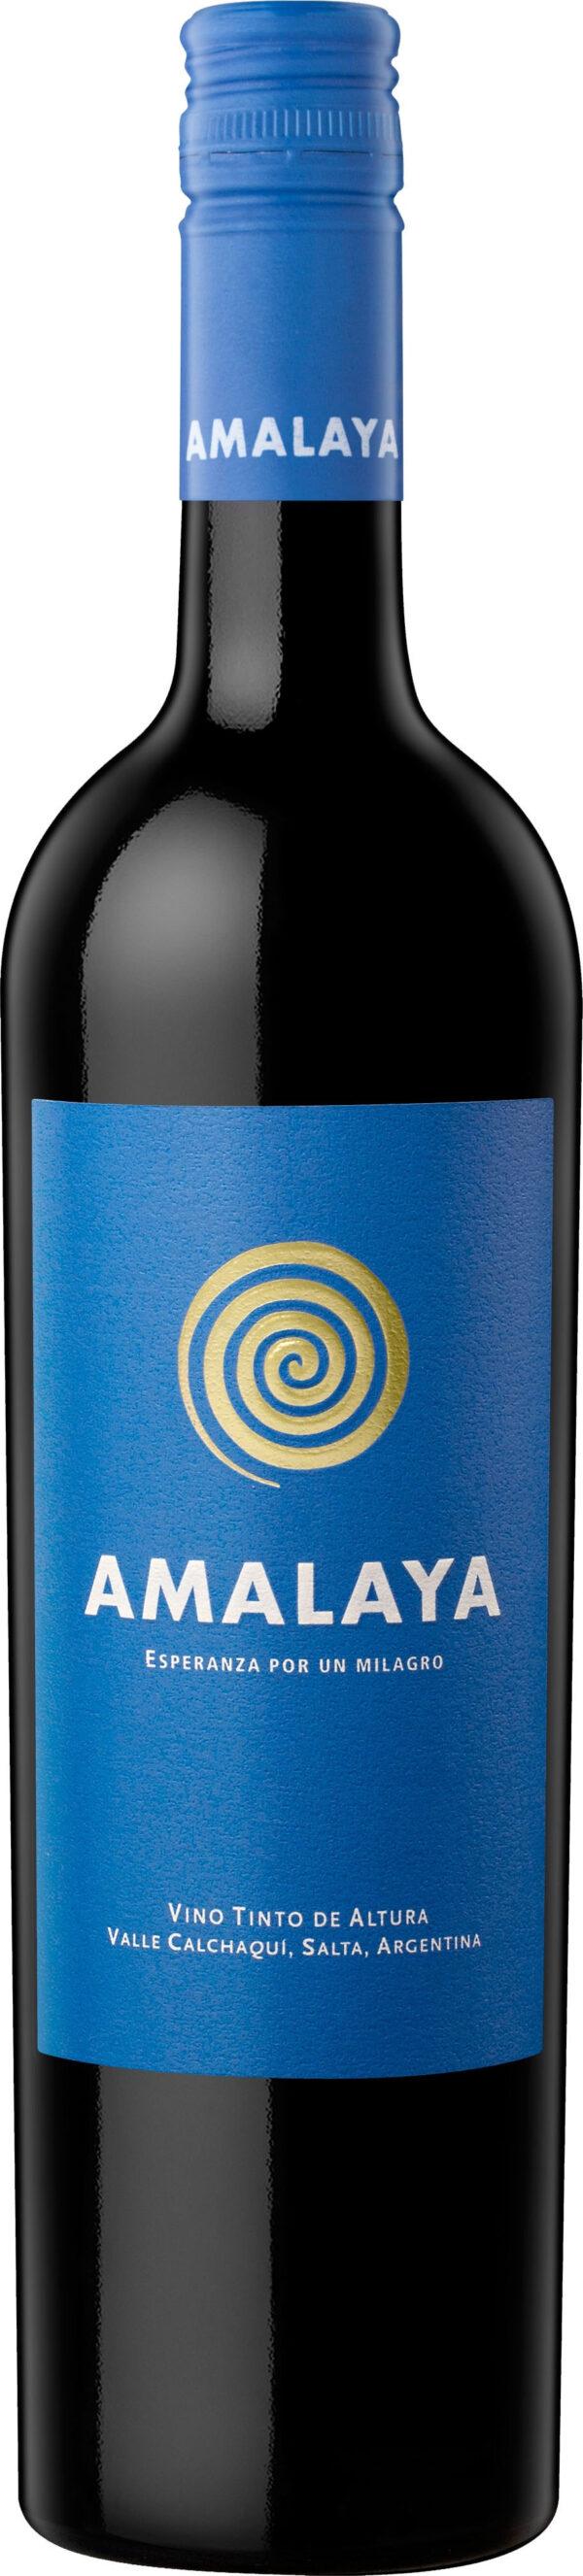 Amalaya - Amalaya Tinto Malbec 2019 75cl Bottle